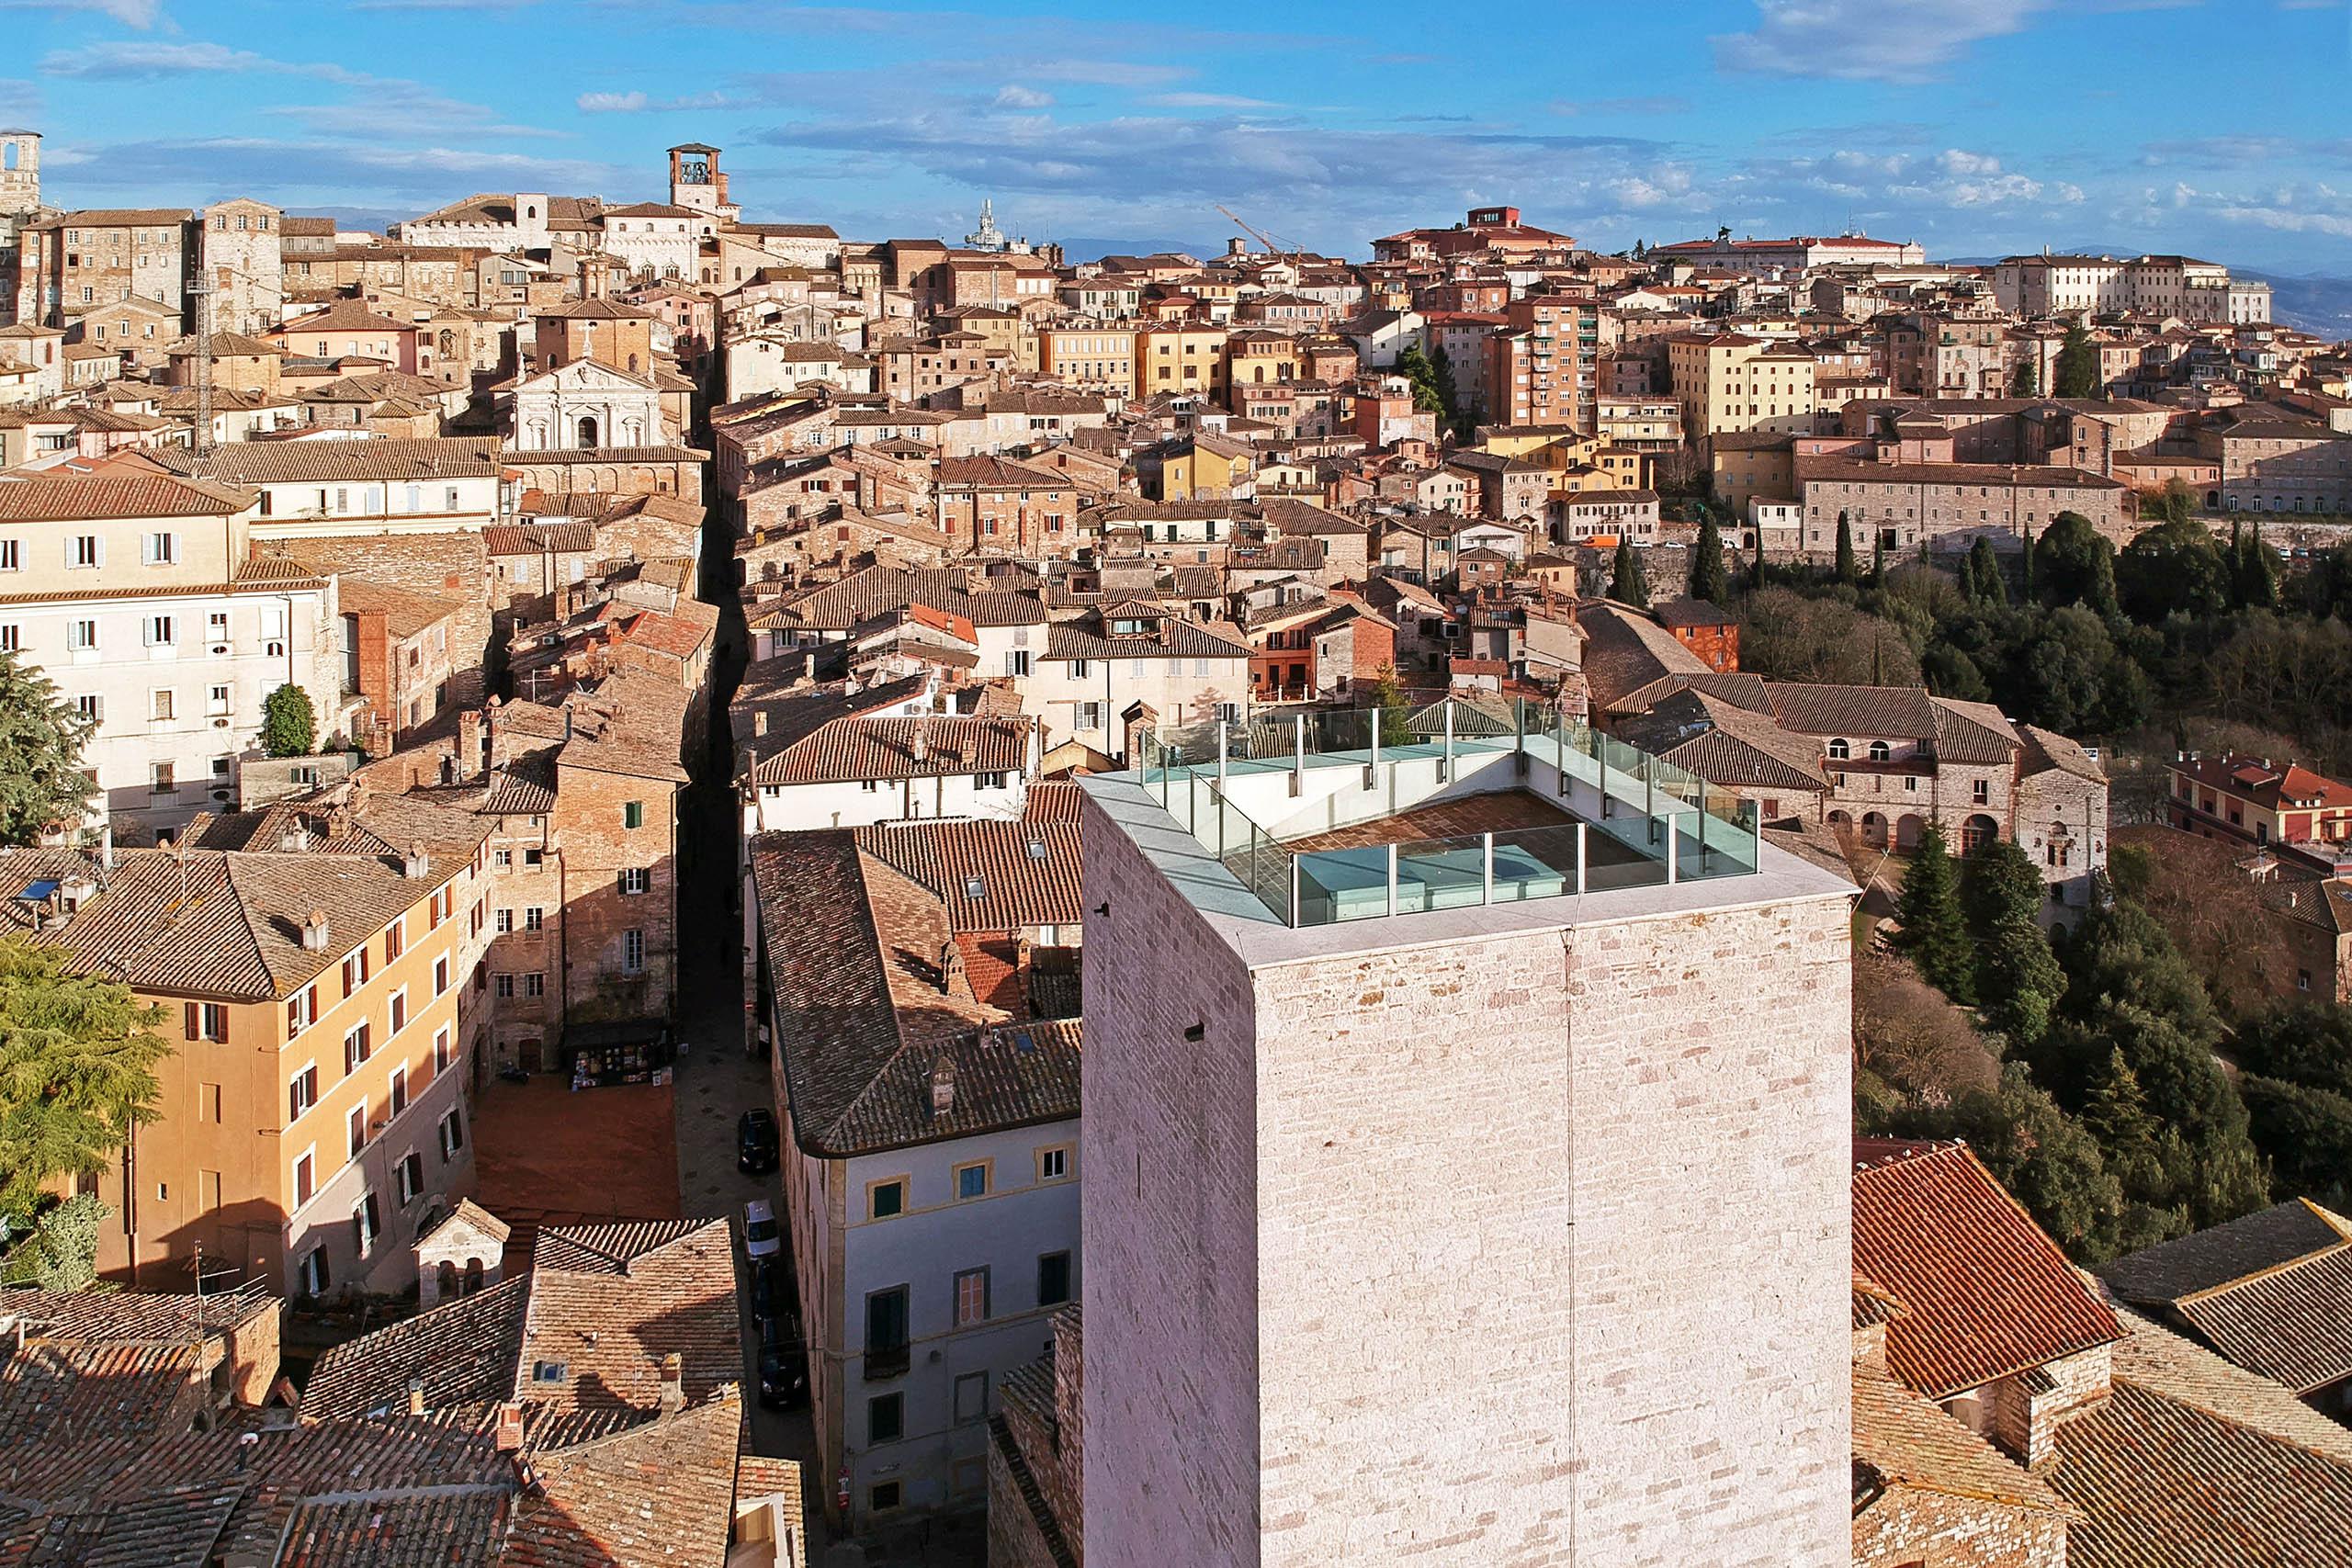 Best Instagram Perugia Italy Shots